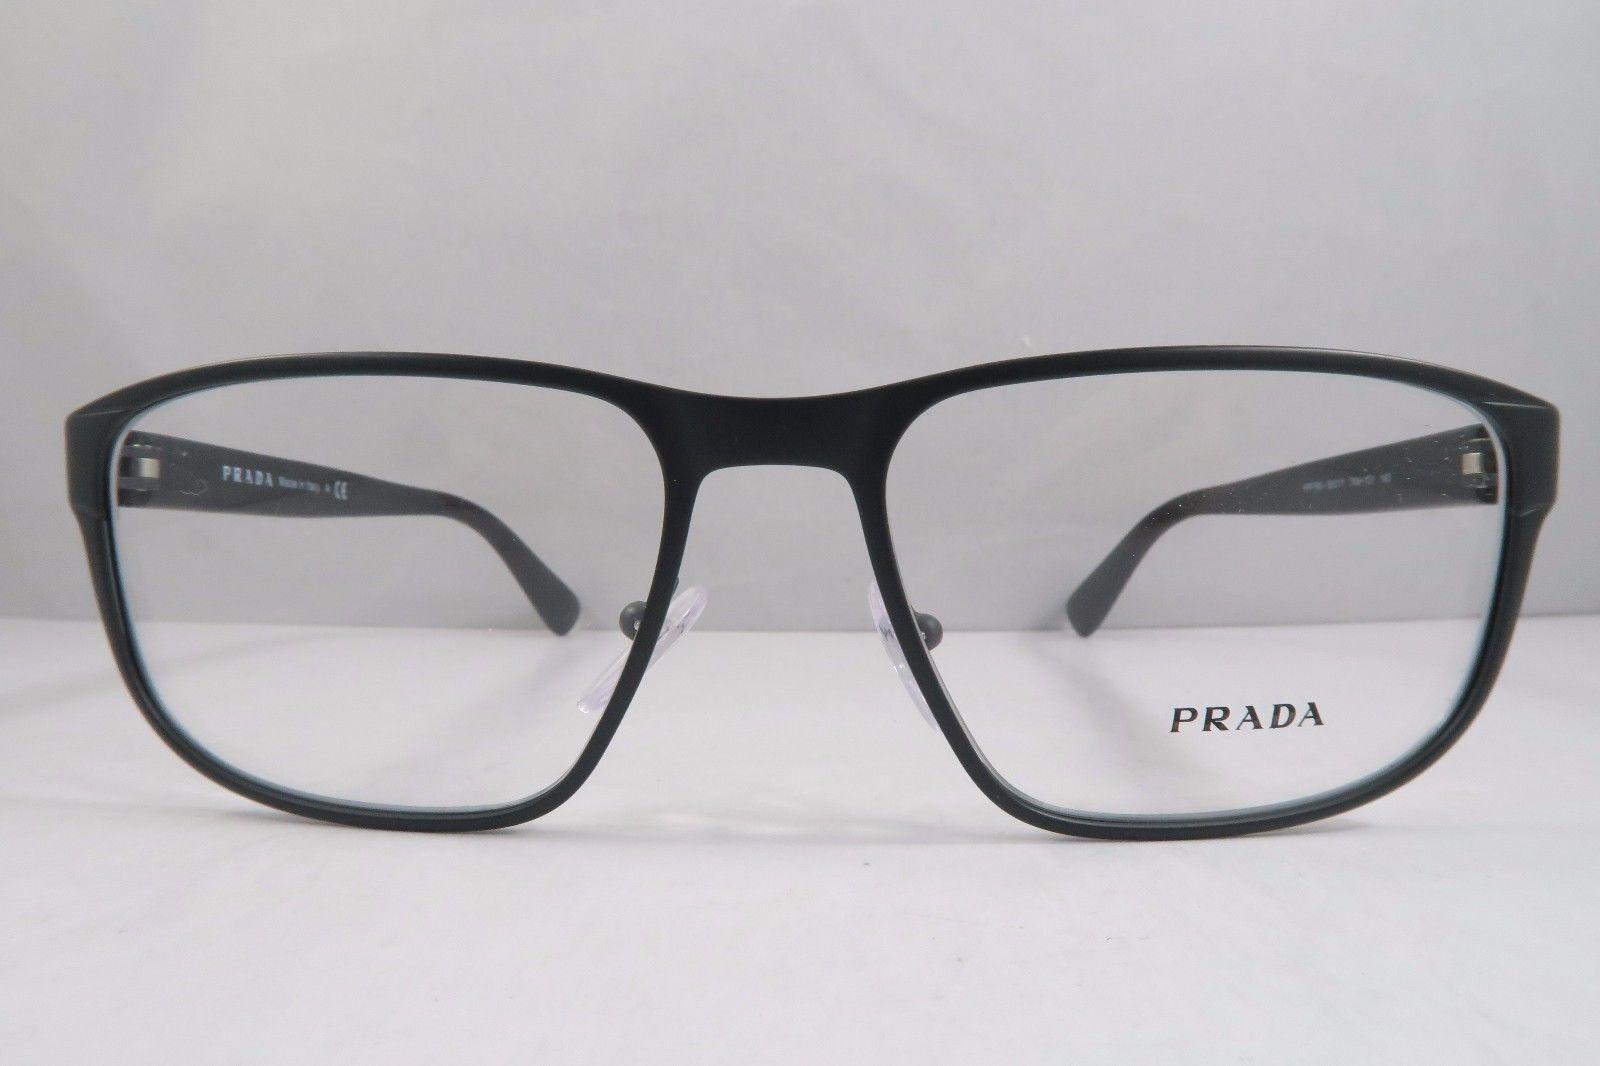 7ca634abcadc Prada VPR 56S TKM-1O1 Matte Grey   Black and 28 similar items. 57